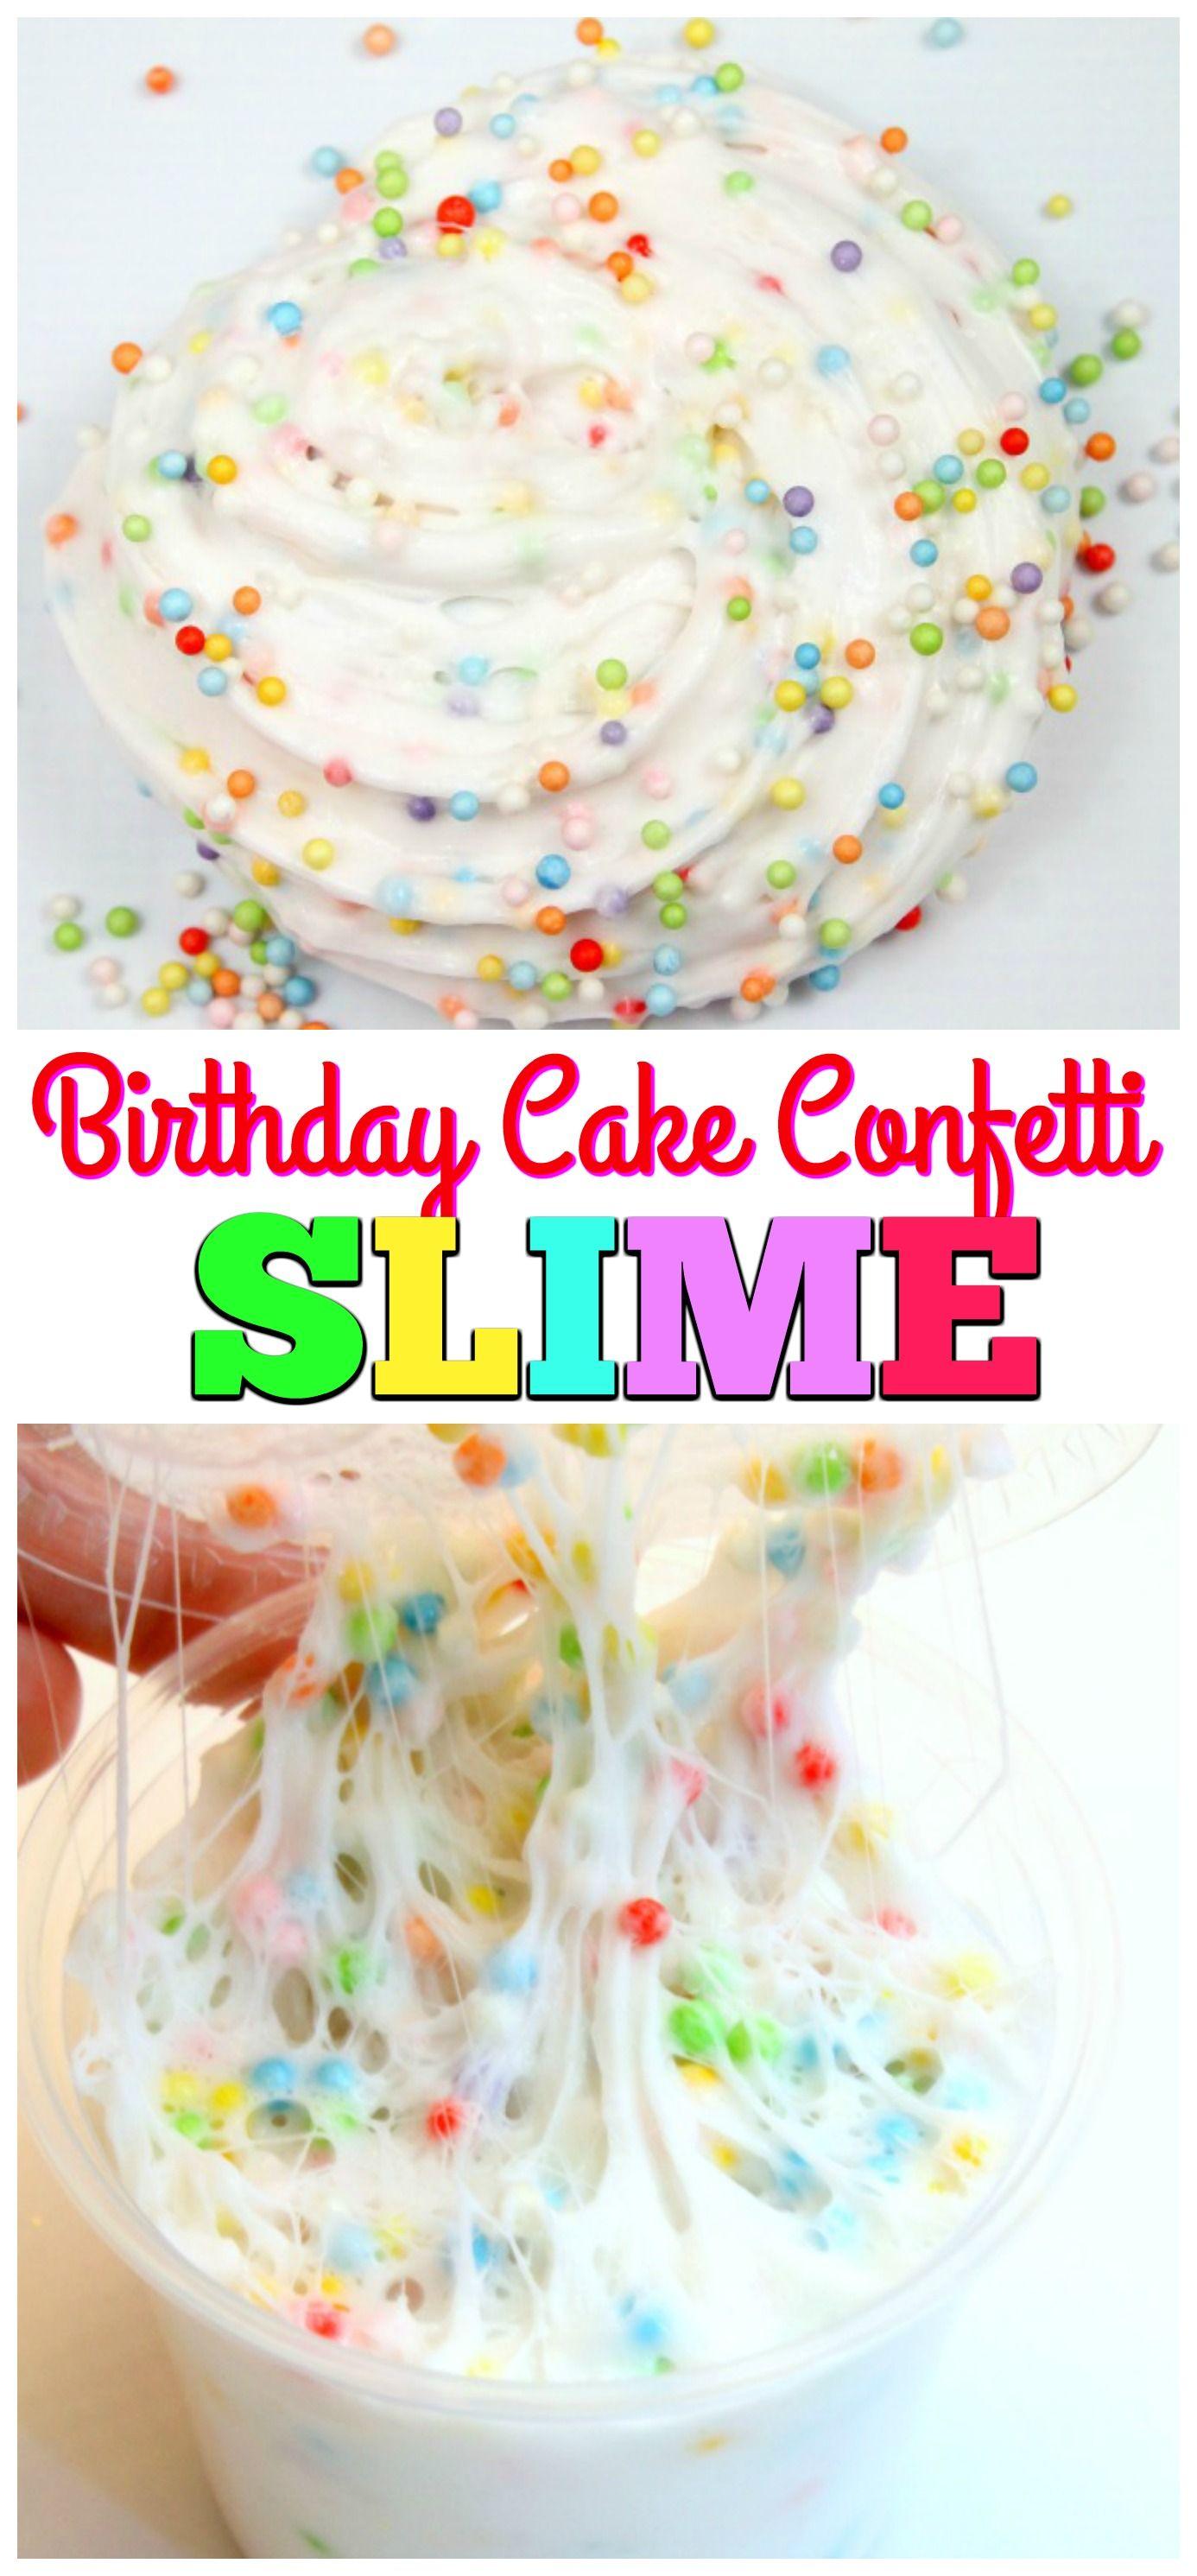 Birthday Cake Confetti Slime! It's So Fluffy